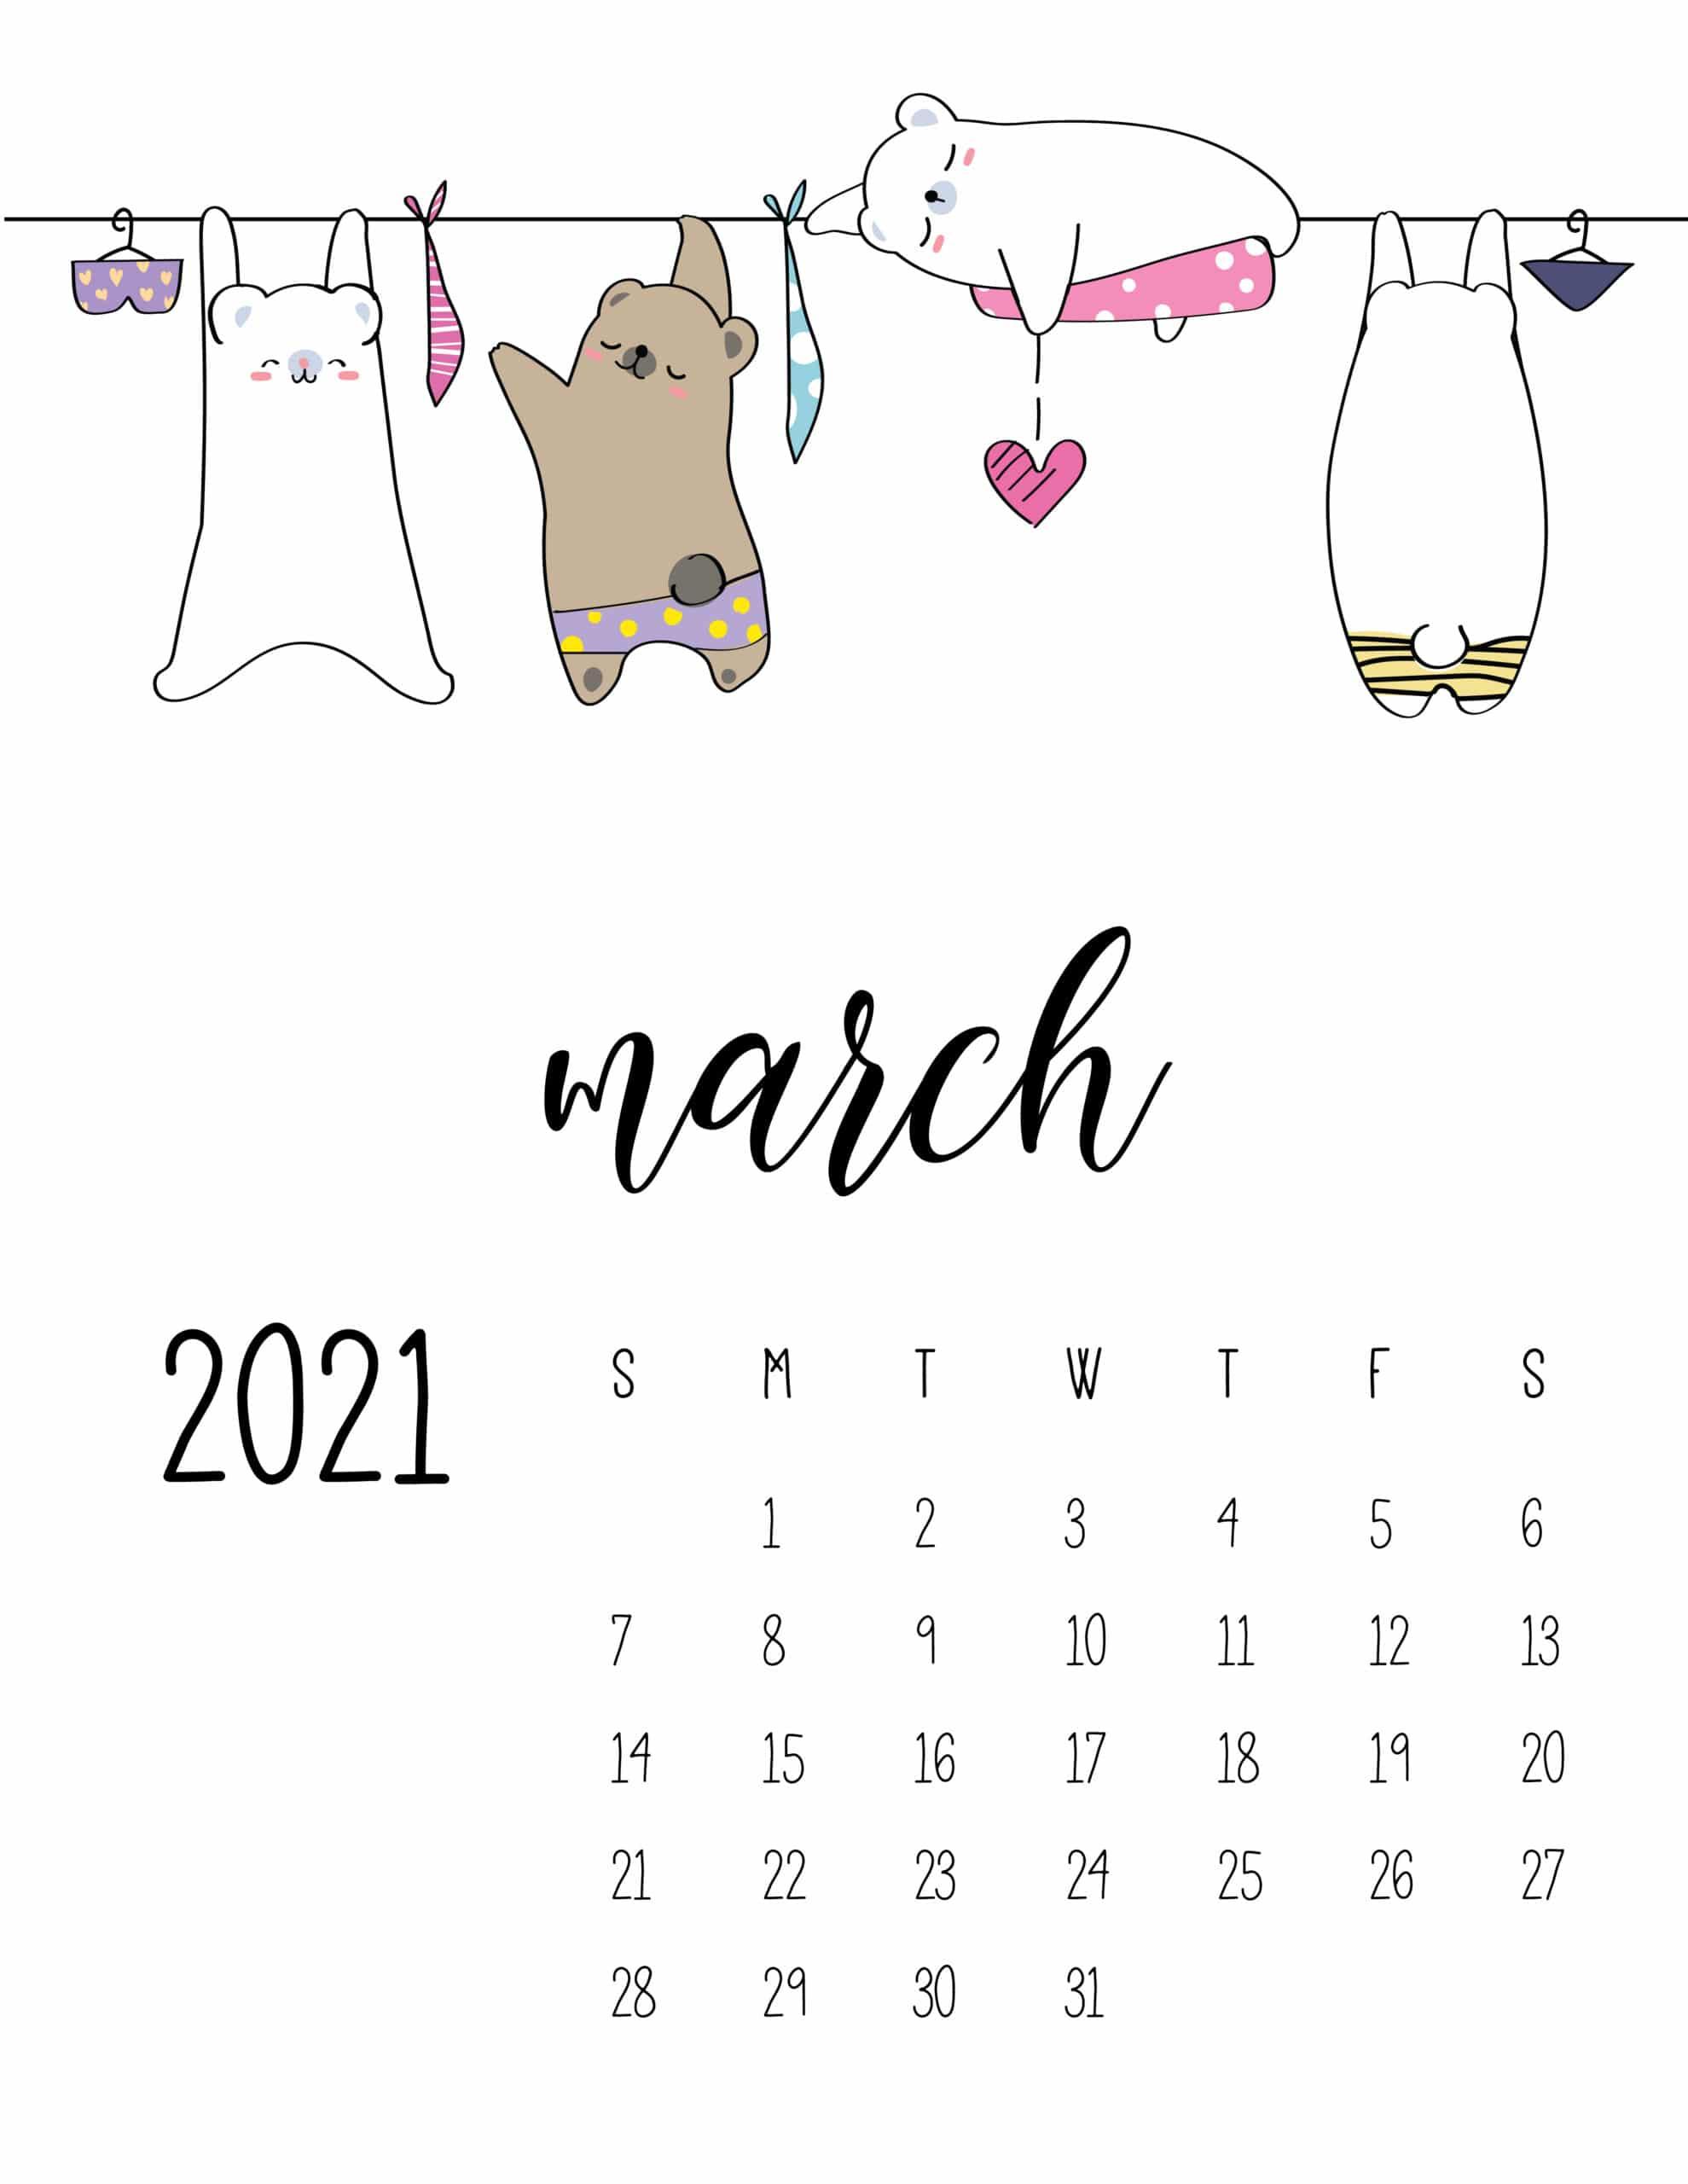 Cute Animals On Washing Line 2021 Calendar - World of ...